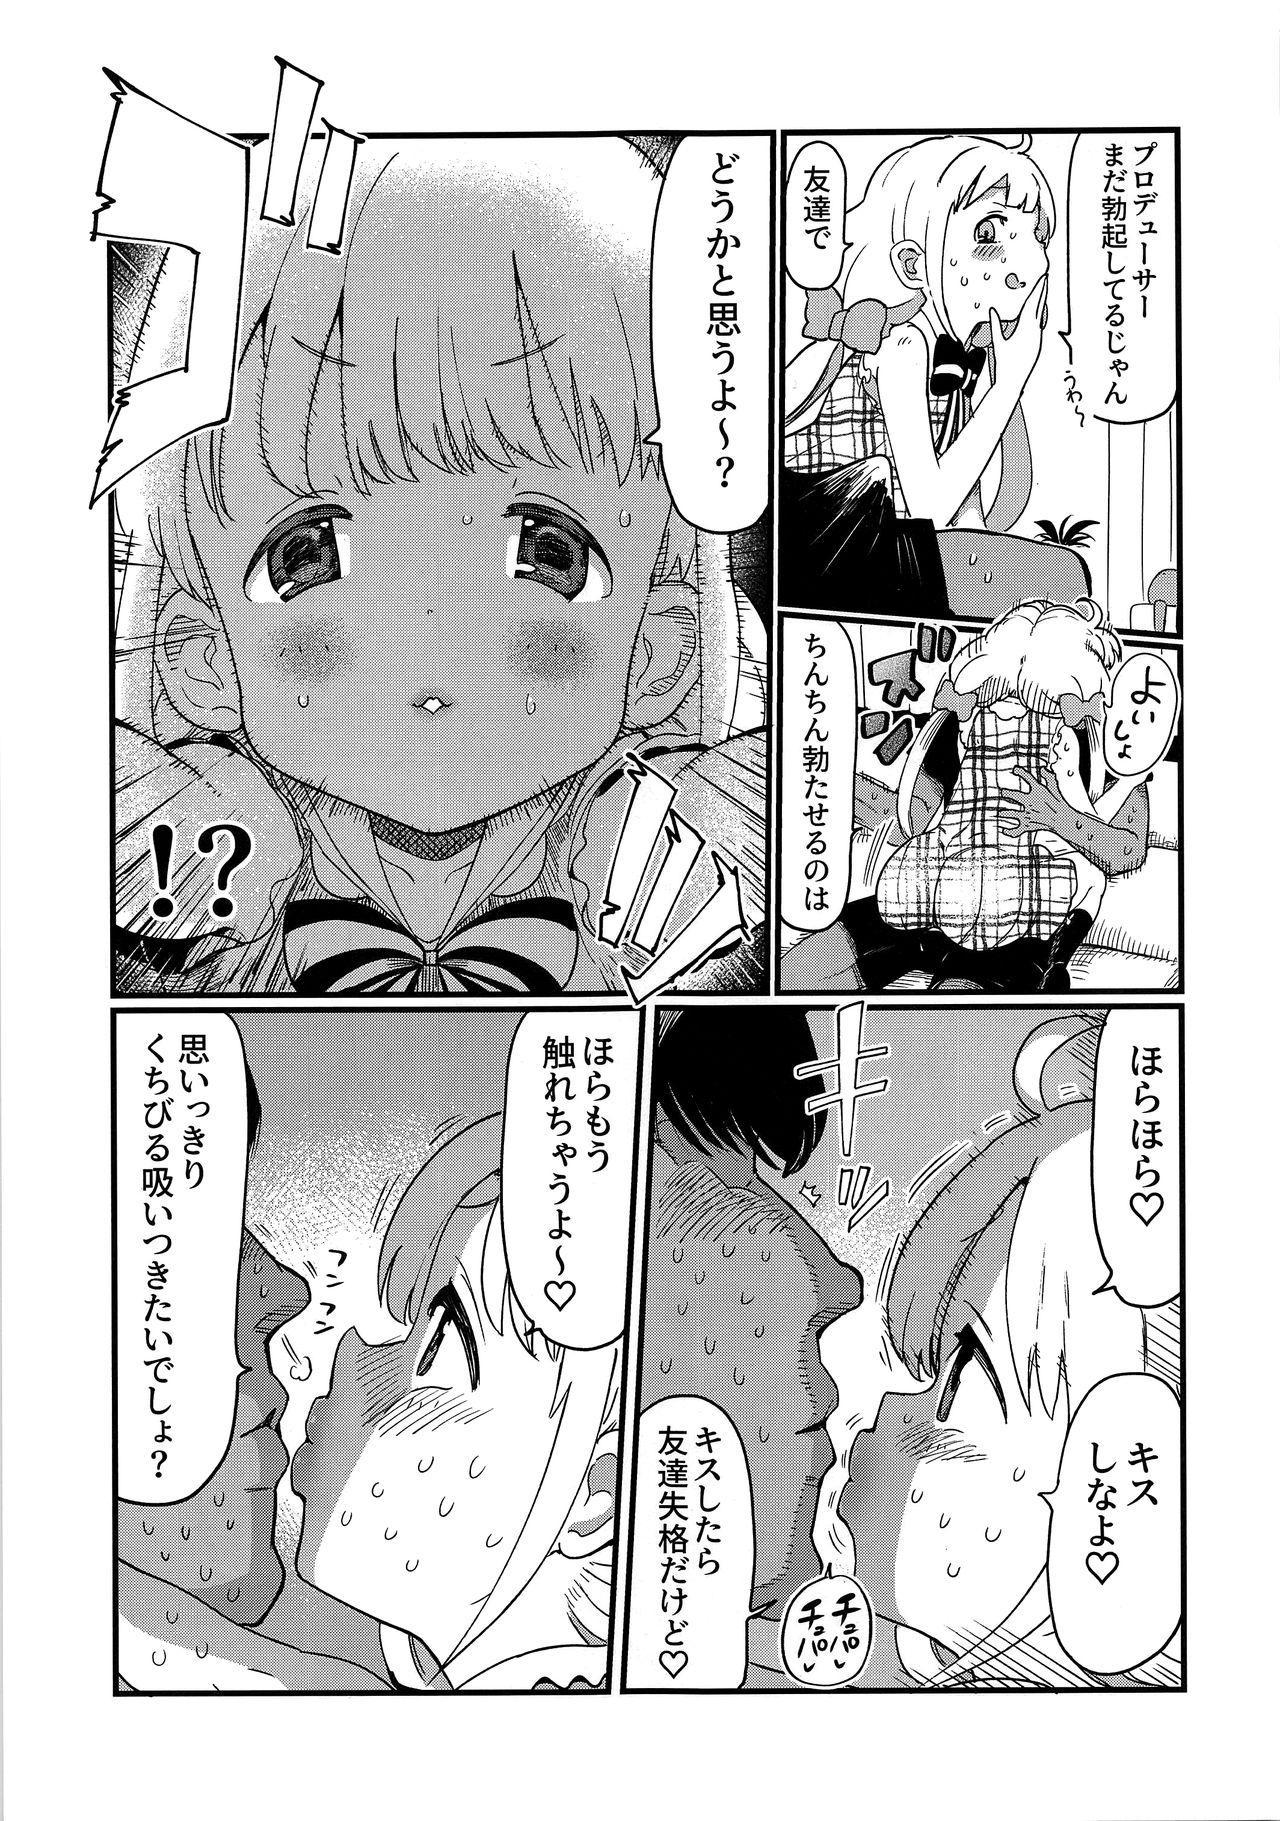 Anzu-chan wa Tomodachi 8